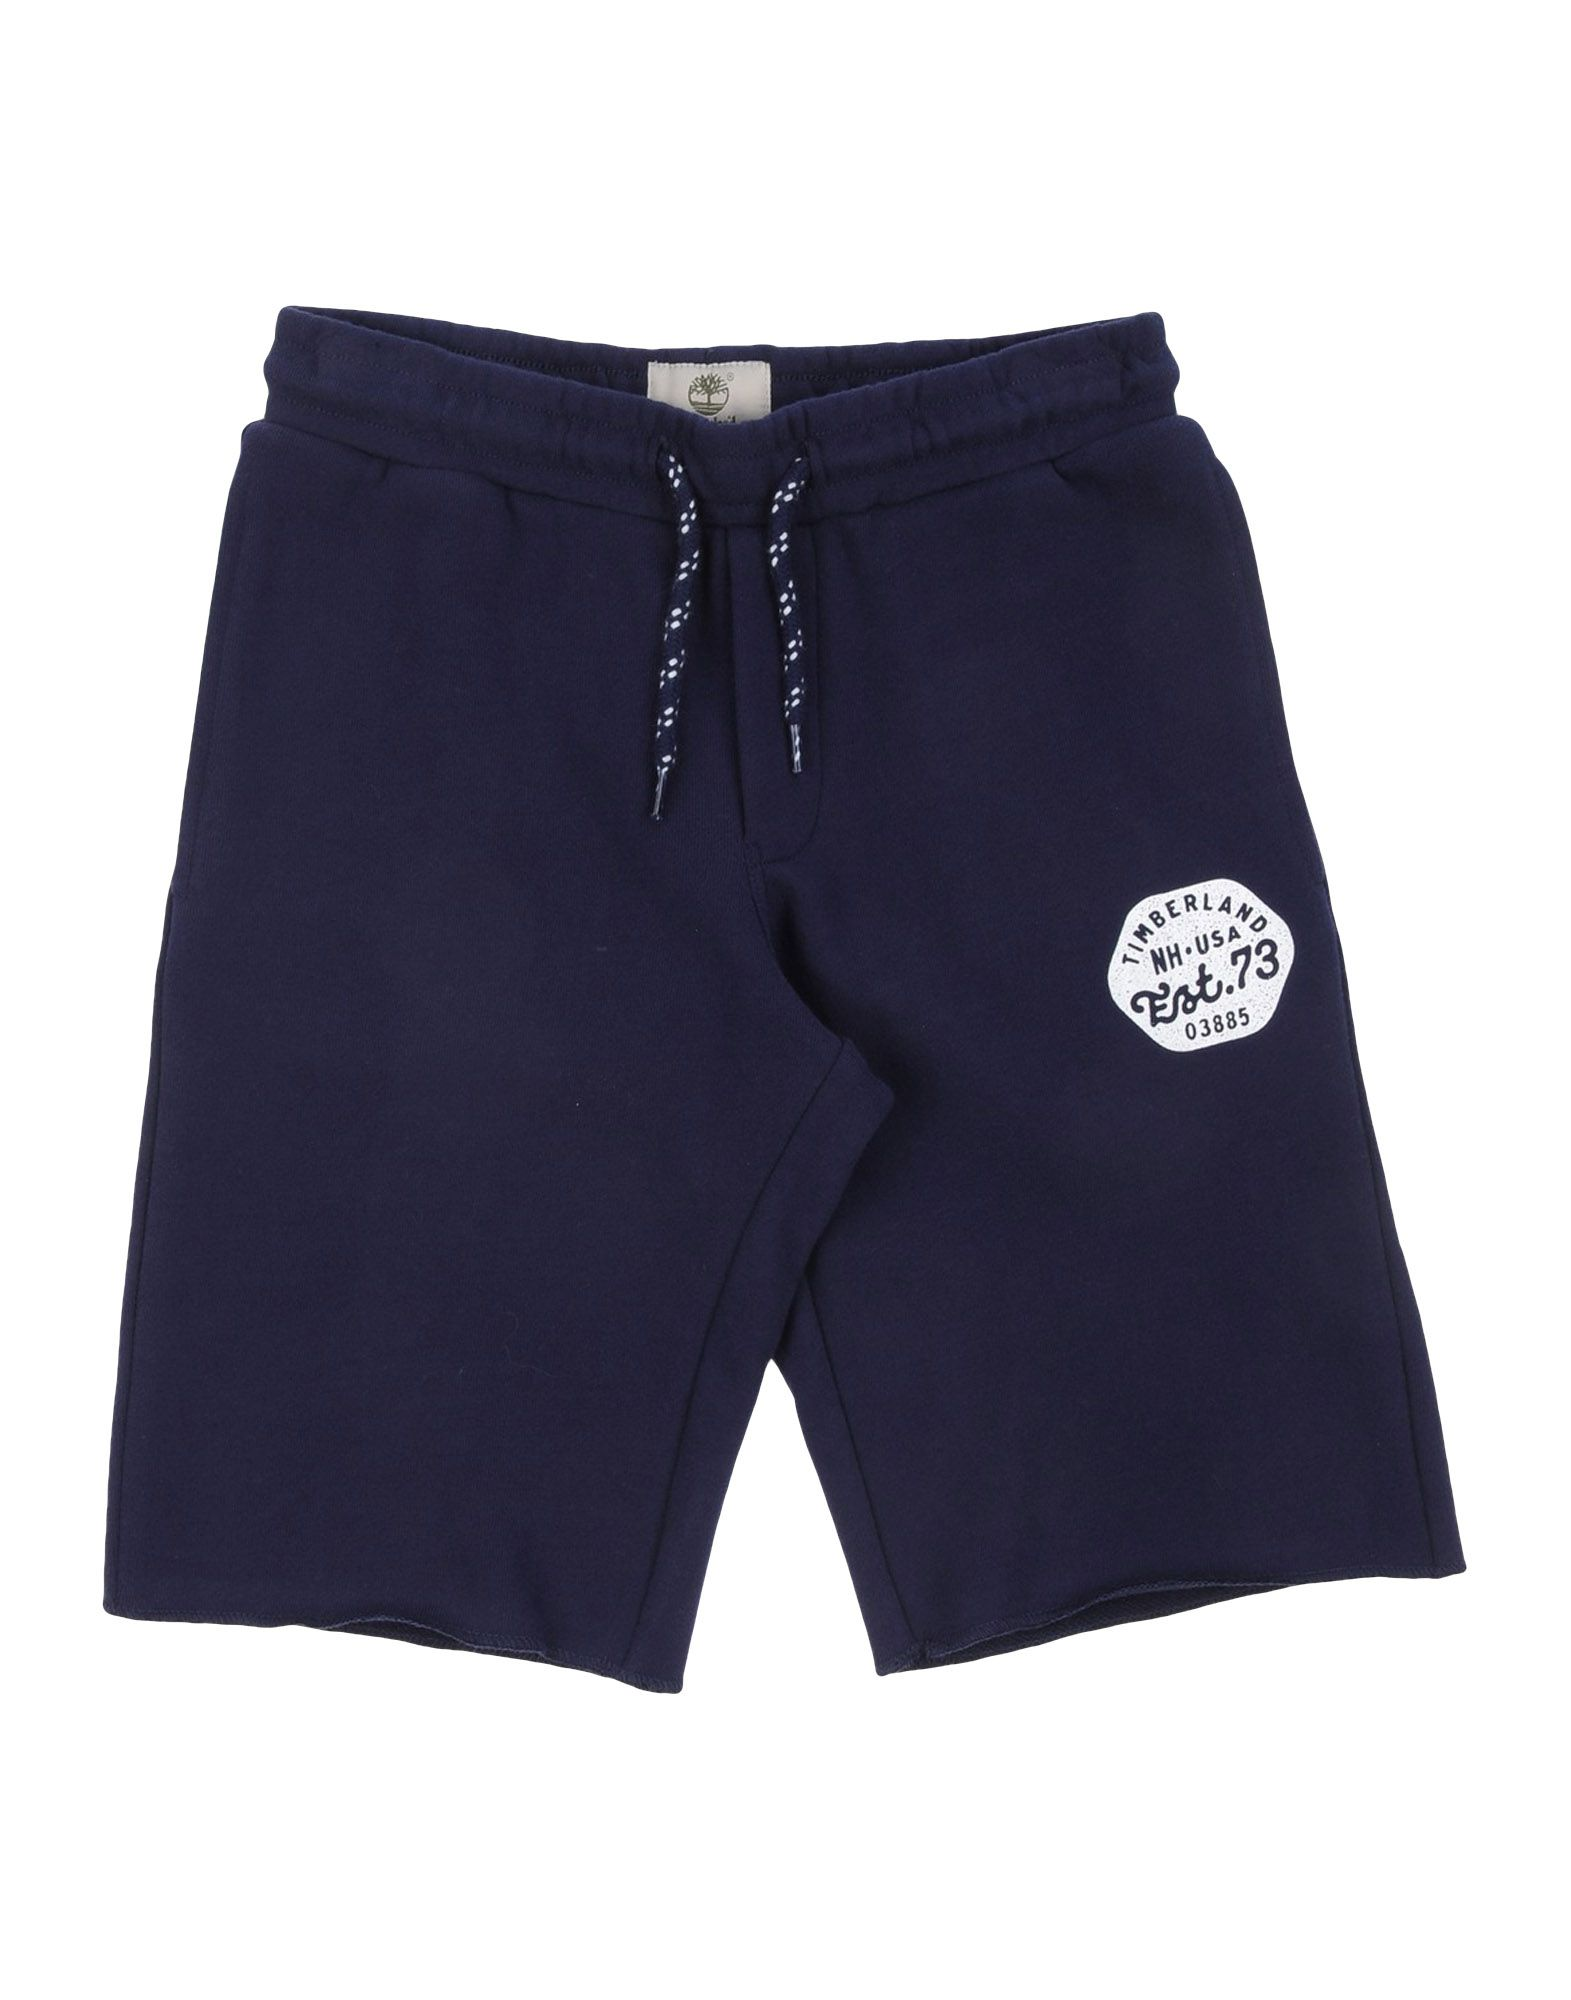 Timberland - Trousers - Bermuda Shorts - On Yoox.com